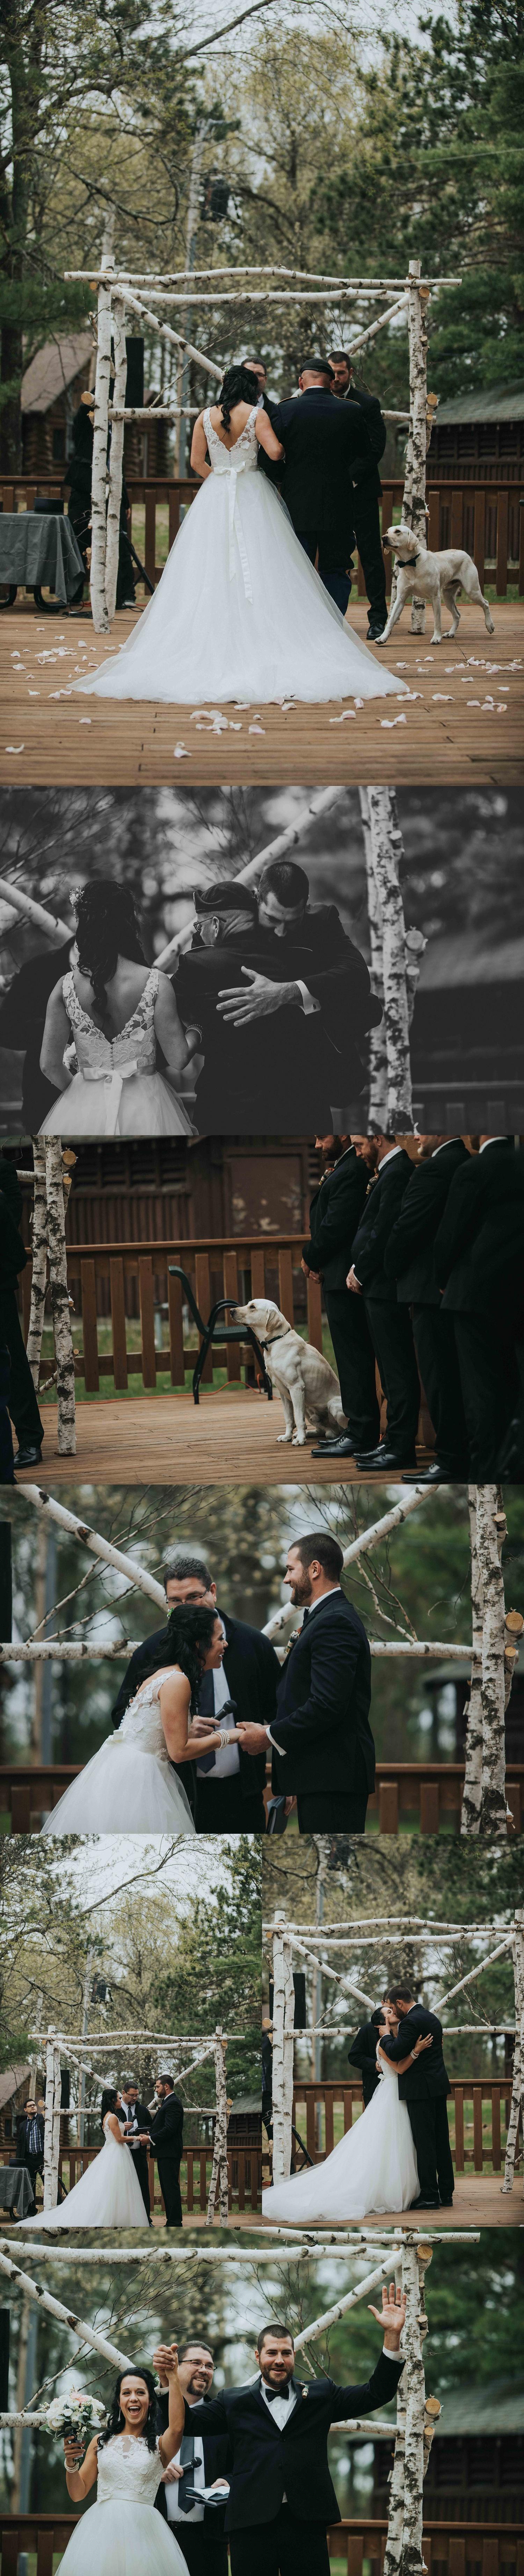 YMCA Camp Alexander Central Wisconsin Wedding With Dogs Photographer Chloe Ann Photography_0006.jpg